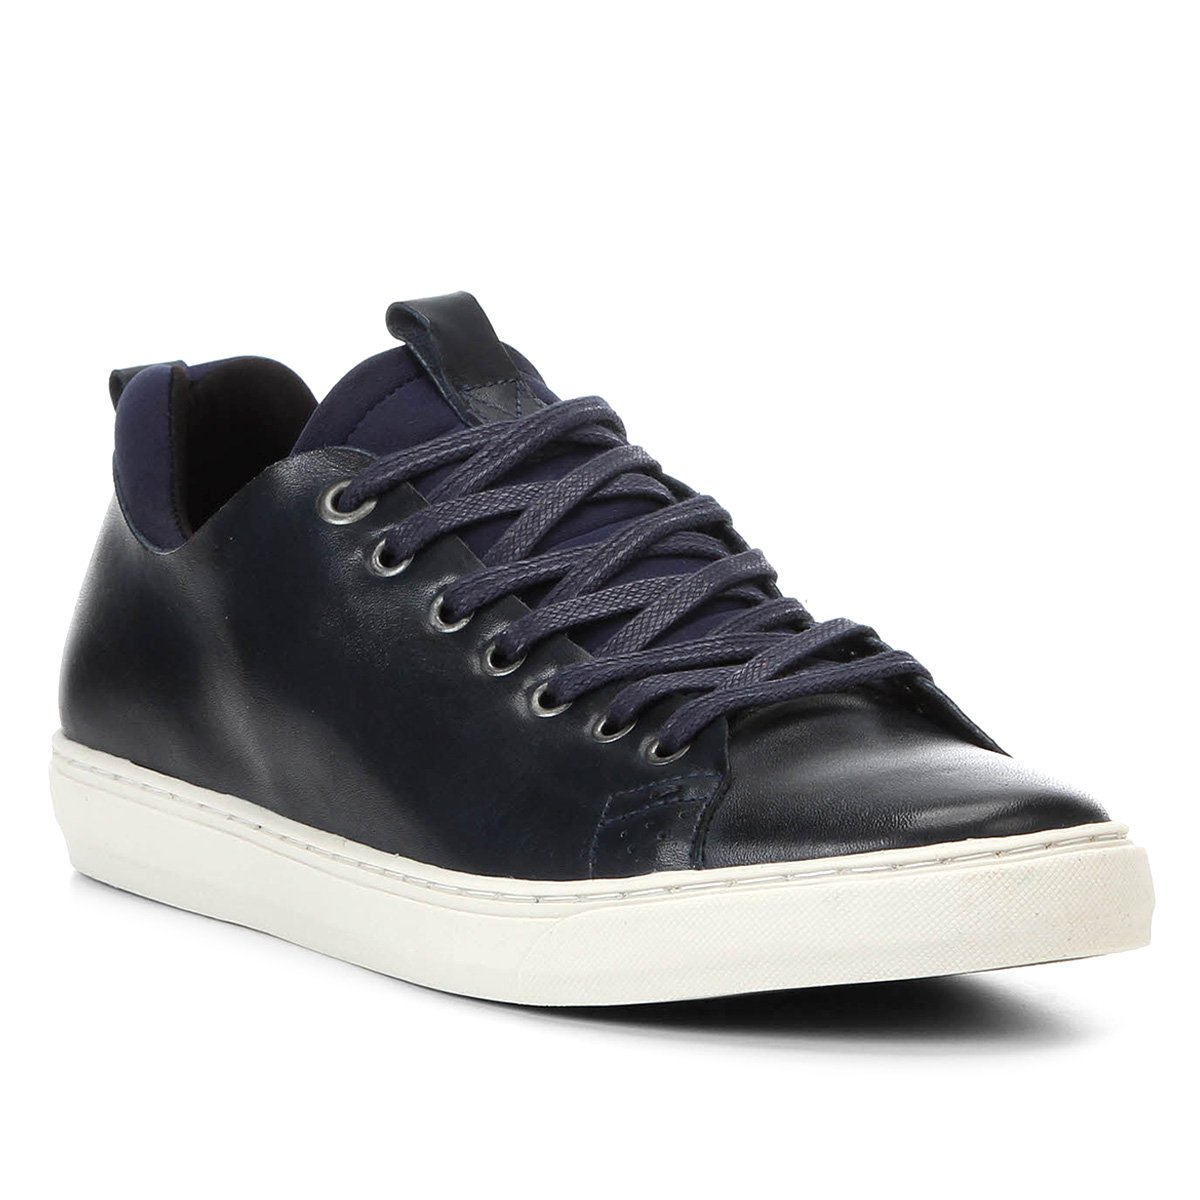 Sapatênis Shoestock Neoprene Couro Masculino